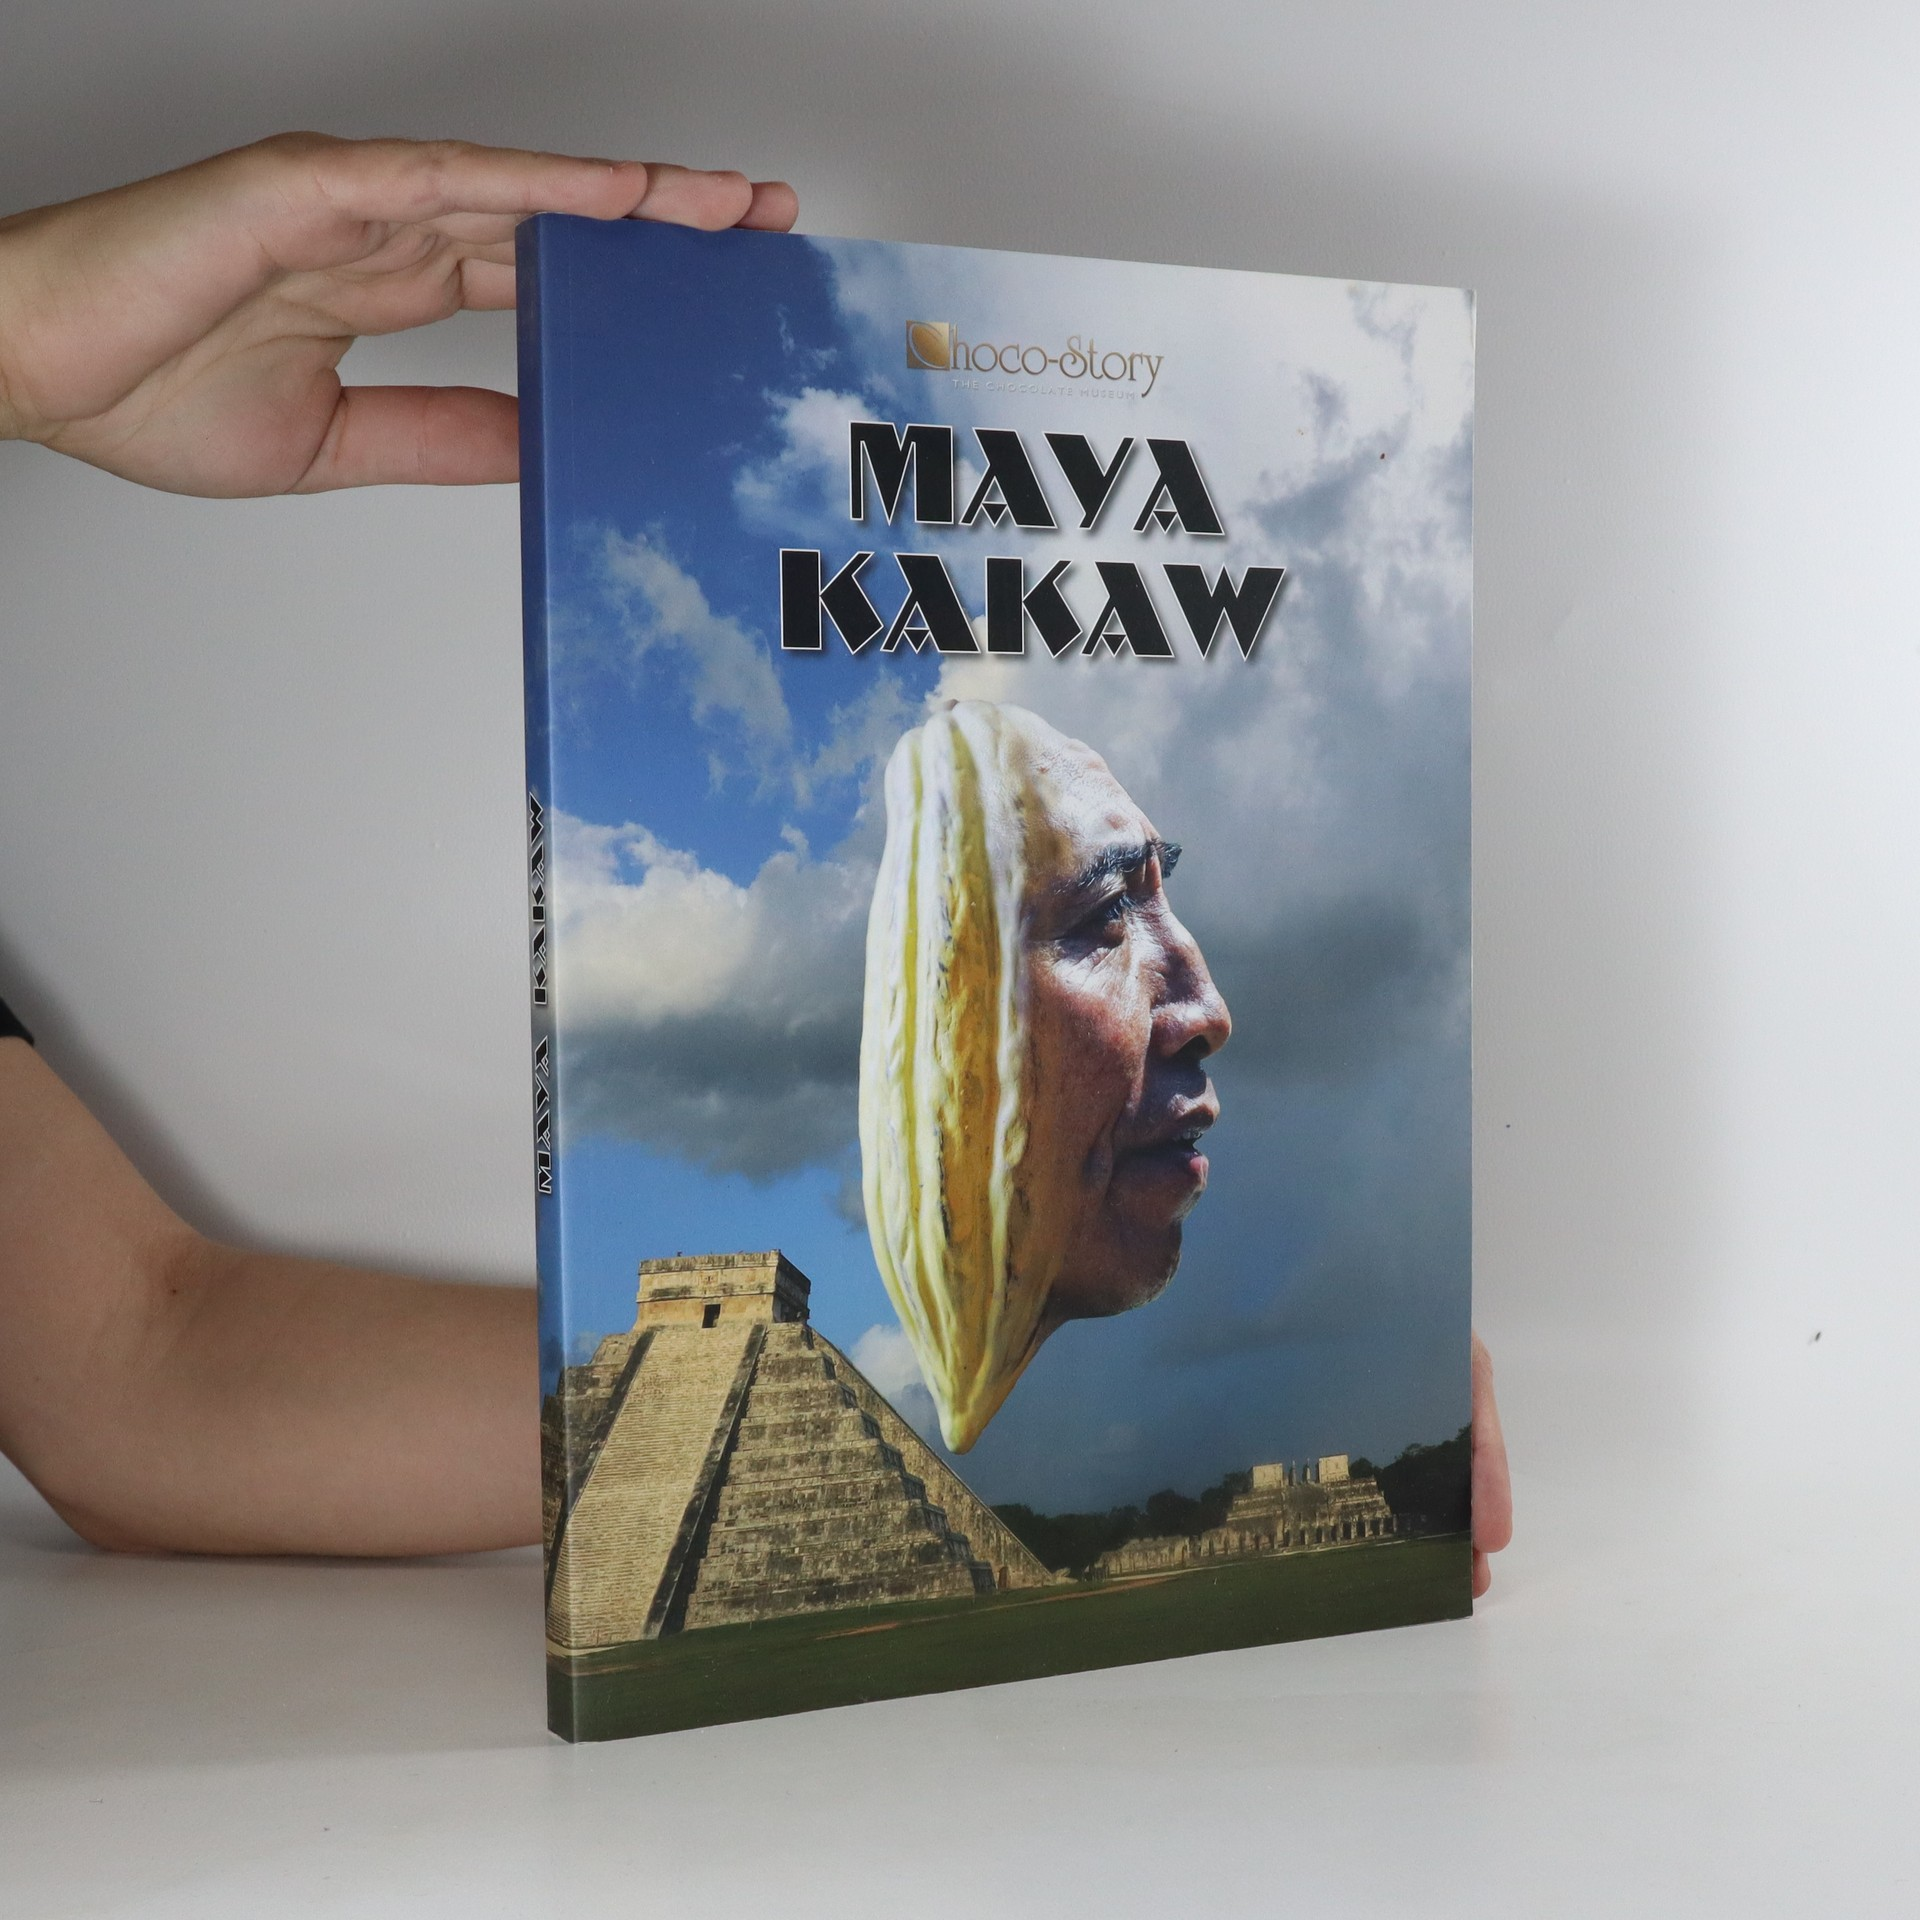 antikvární kniha Maya Kakaw, neuveden